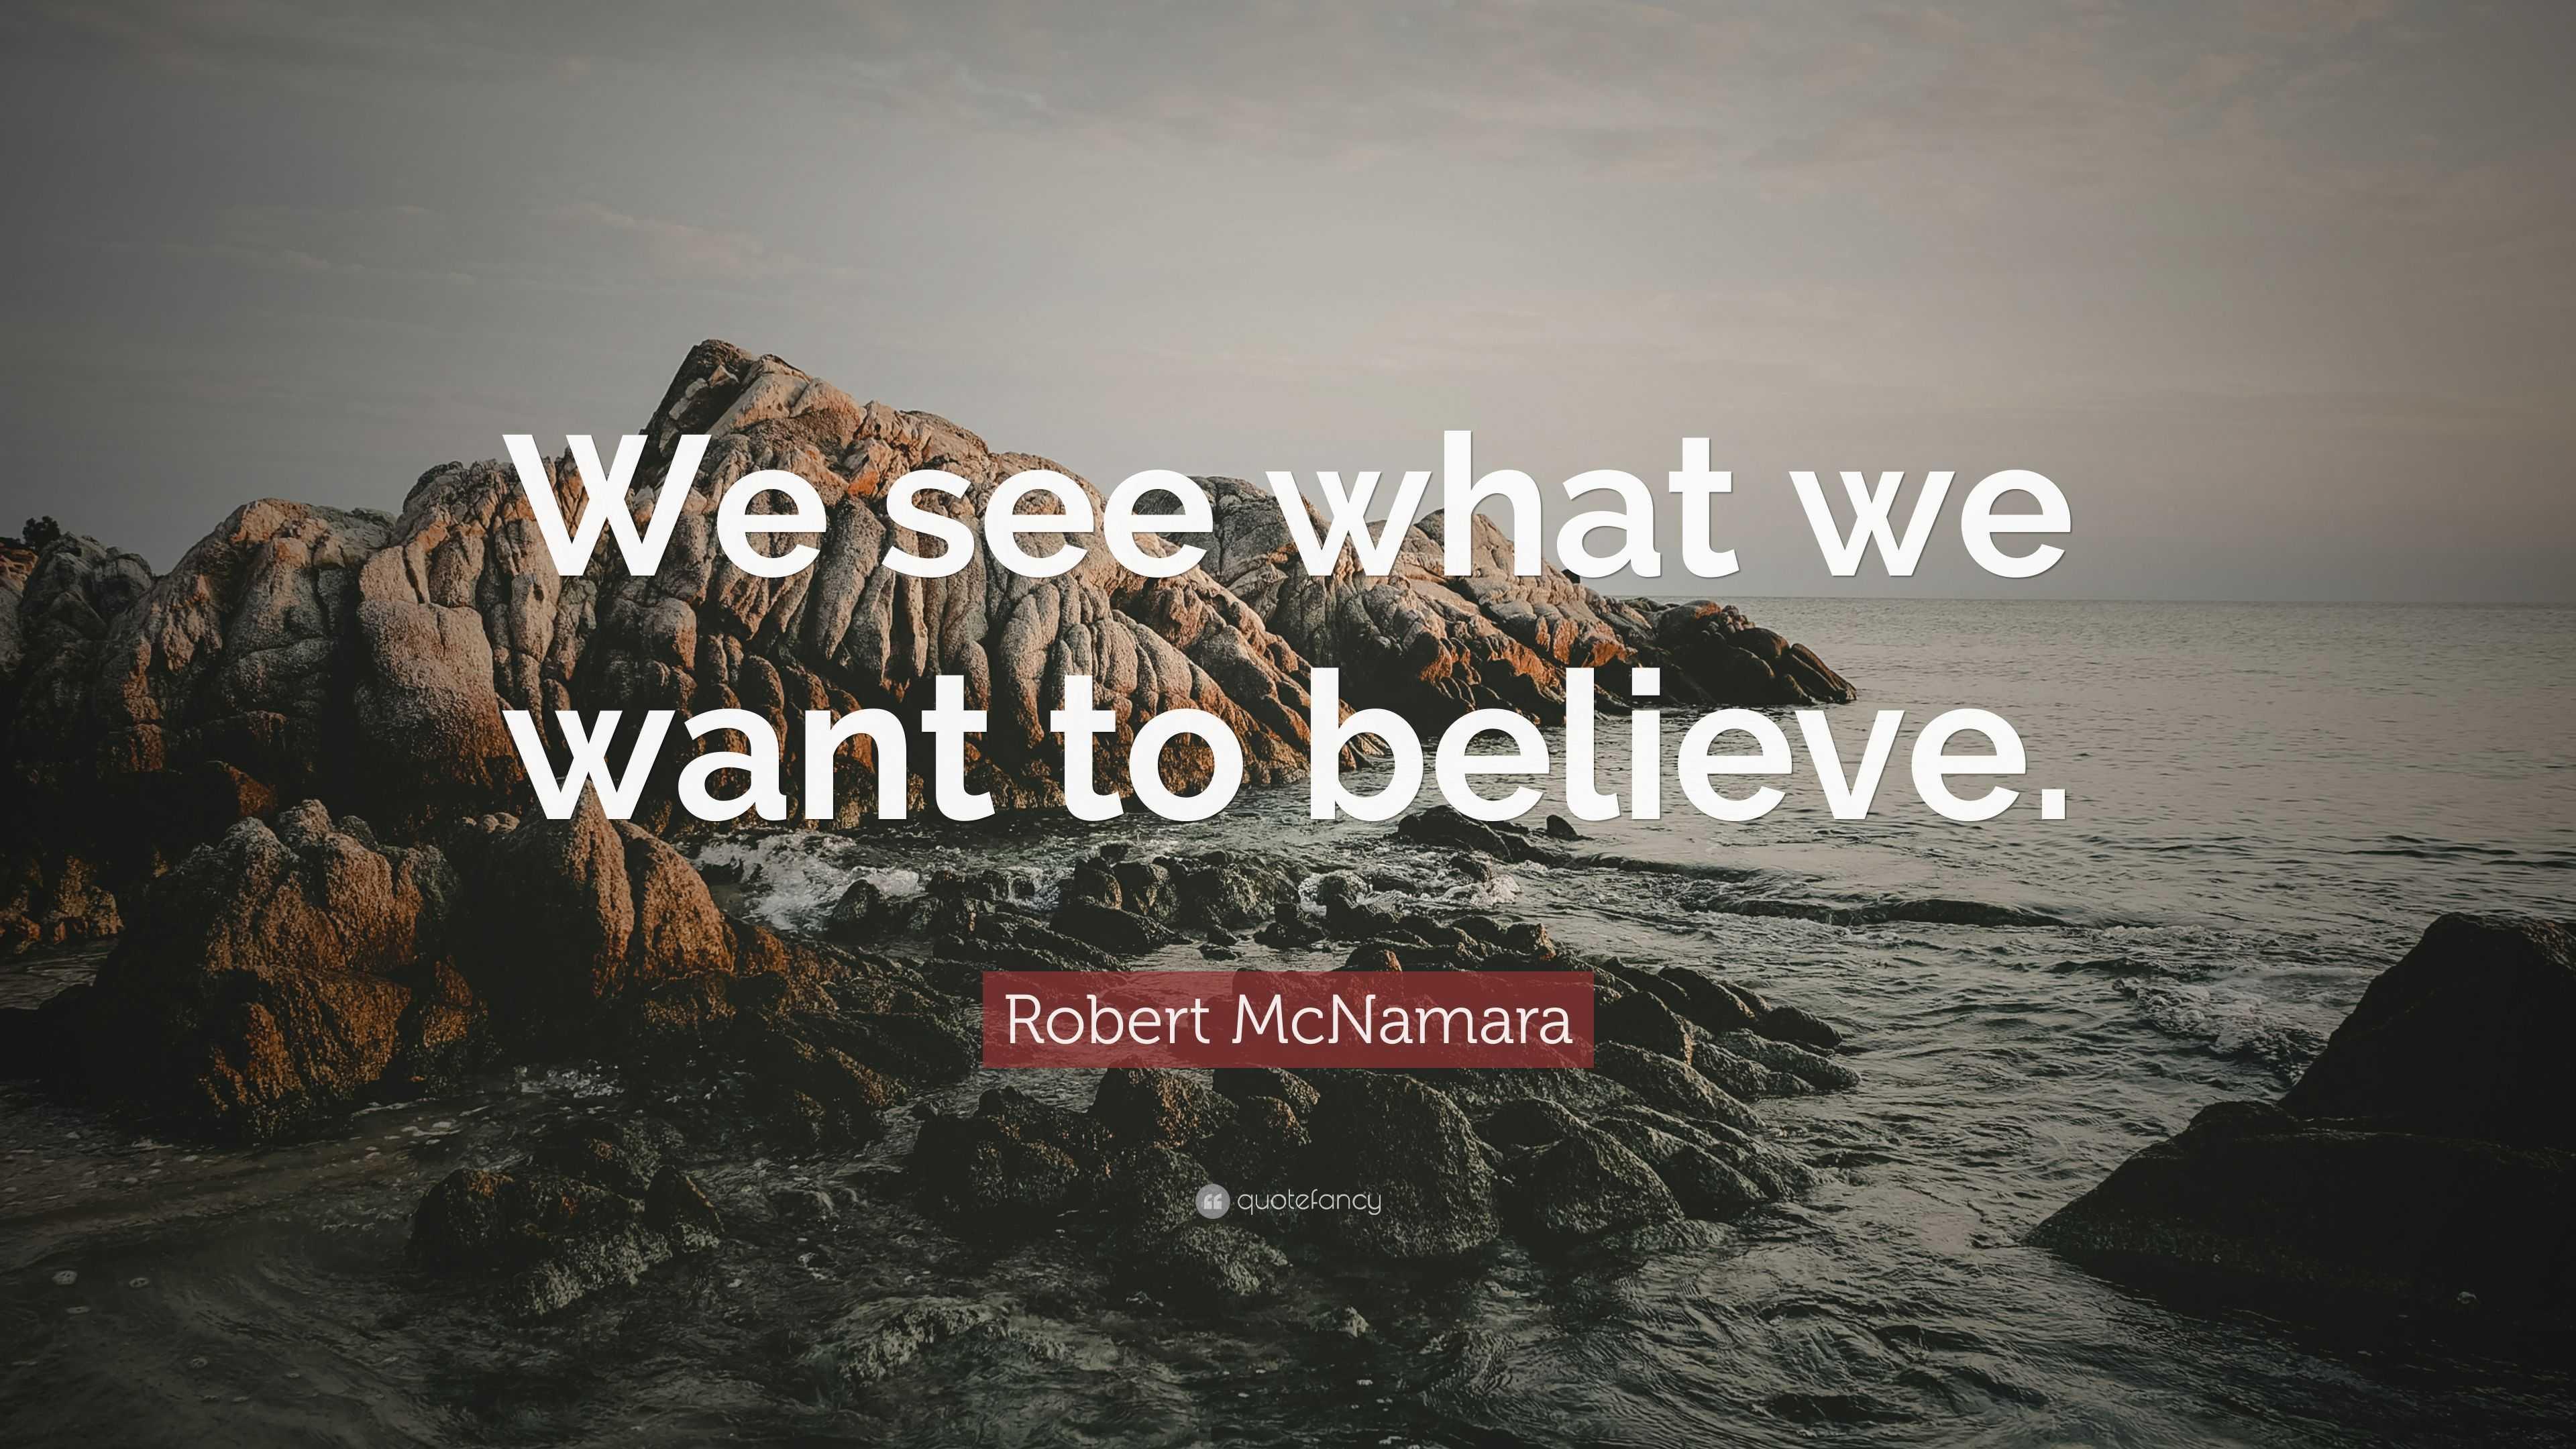 Robert Mcnamara Quote We See What We Want To Believe 7